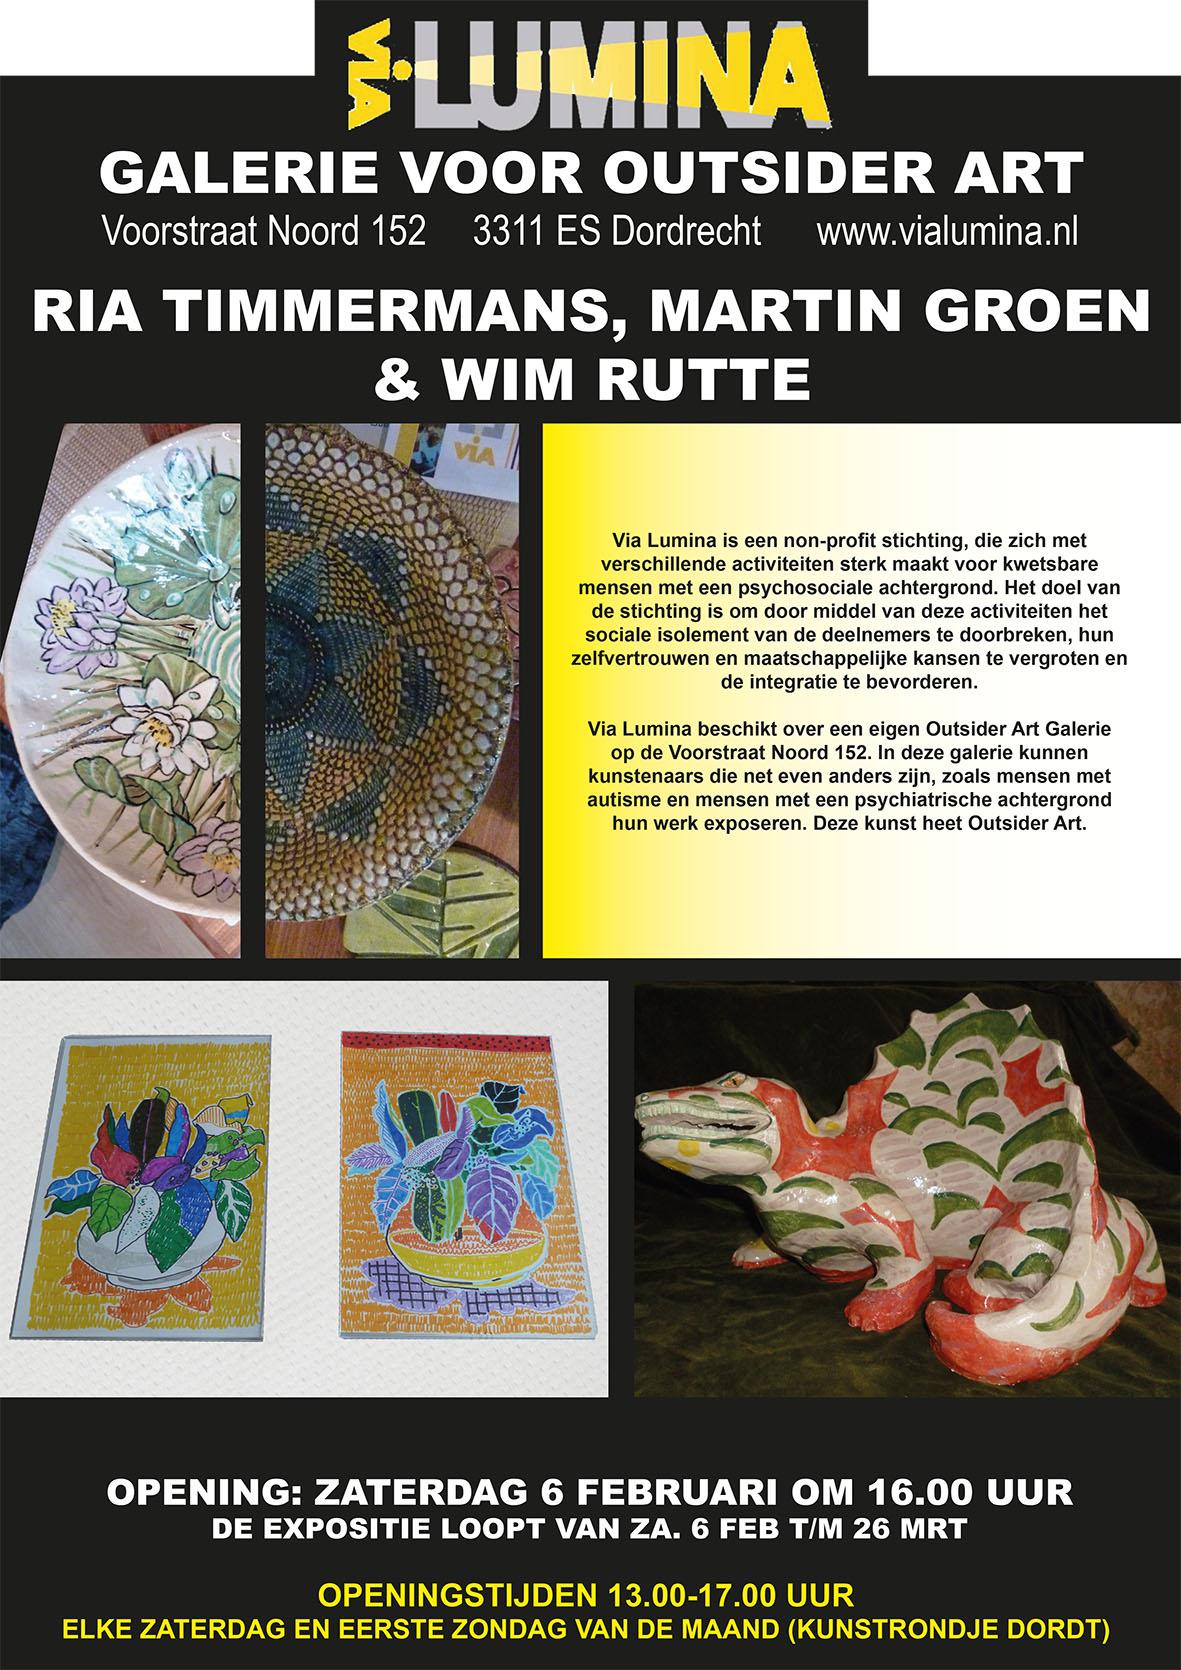 Martin, Ria en Wim